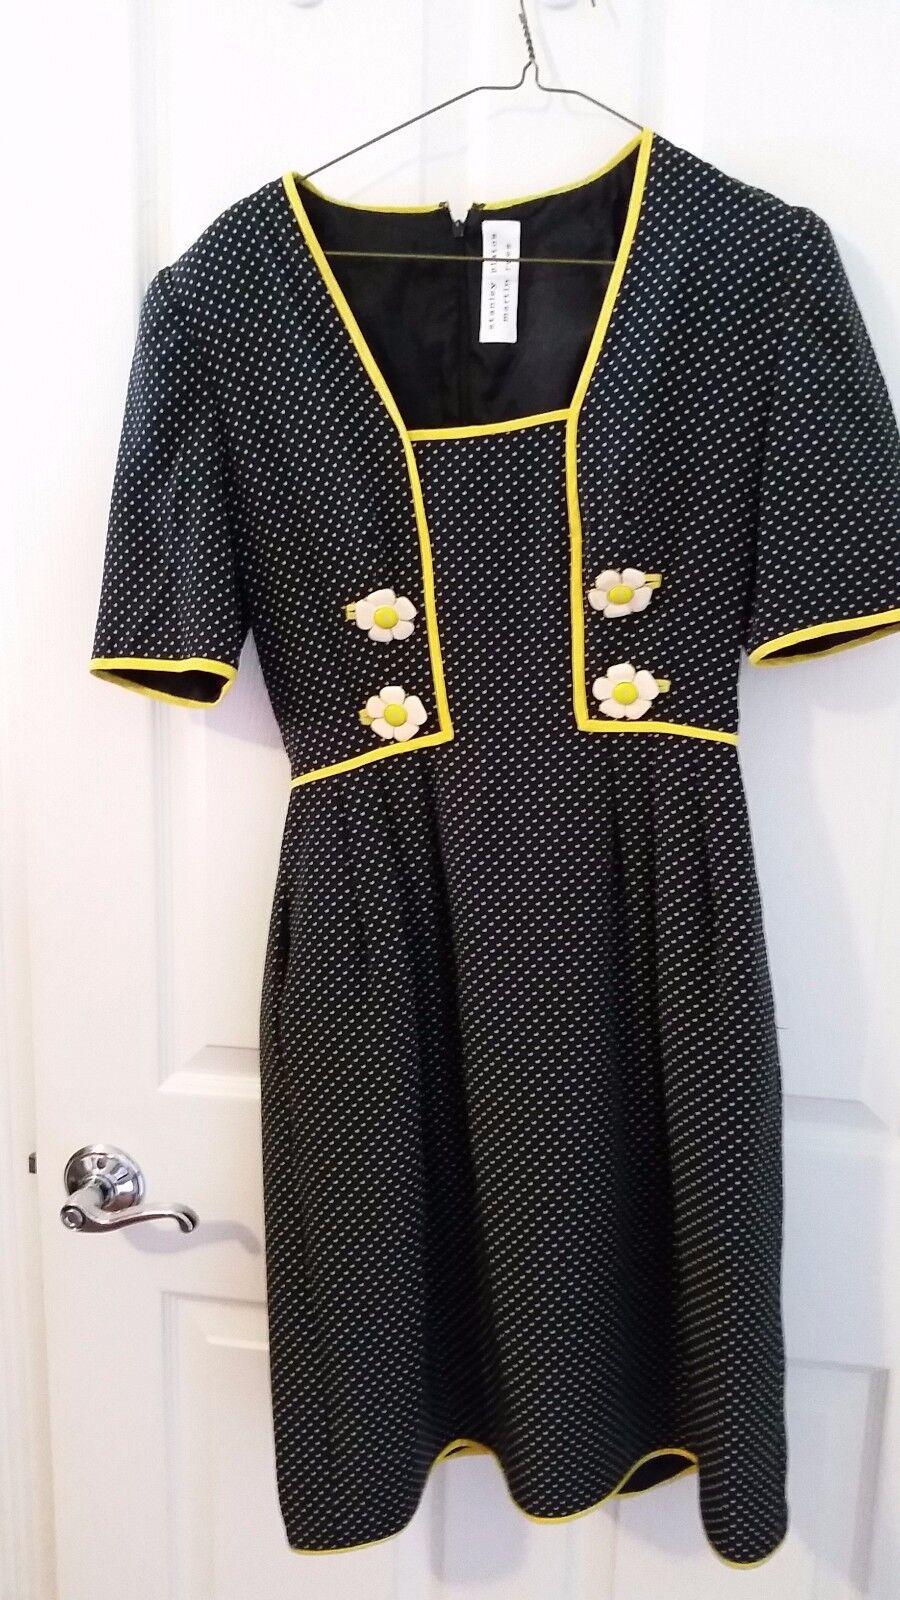 Stanley Platos    Daisy' Dress - Size 6 66068a